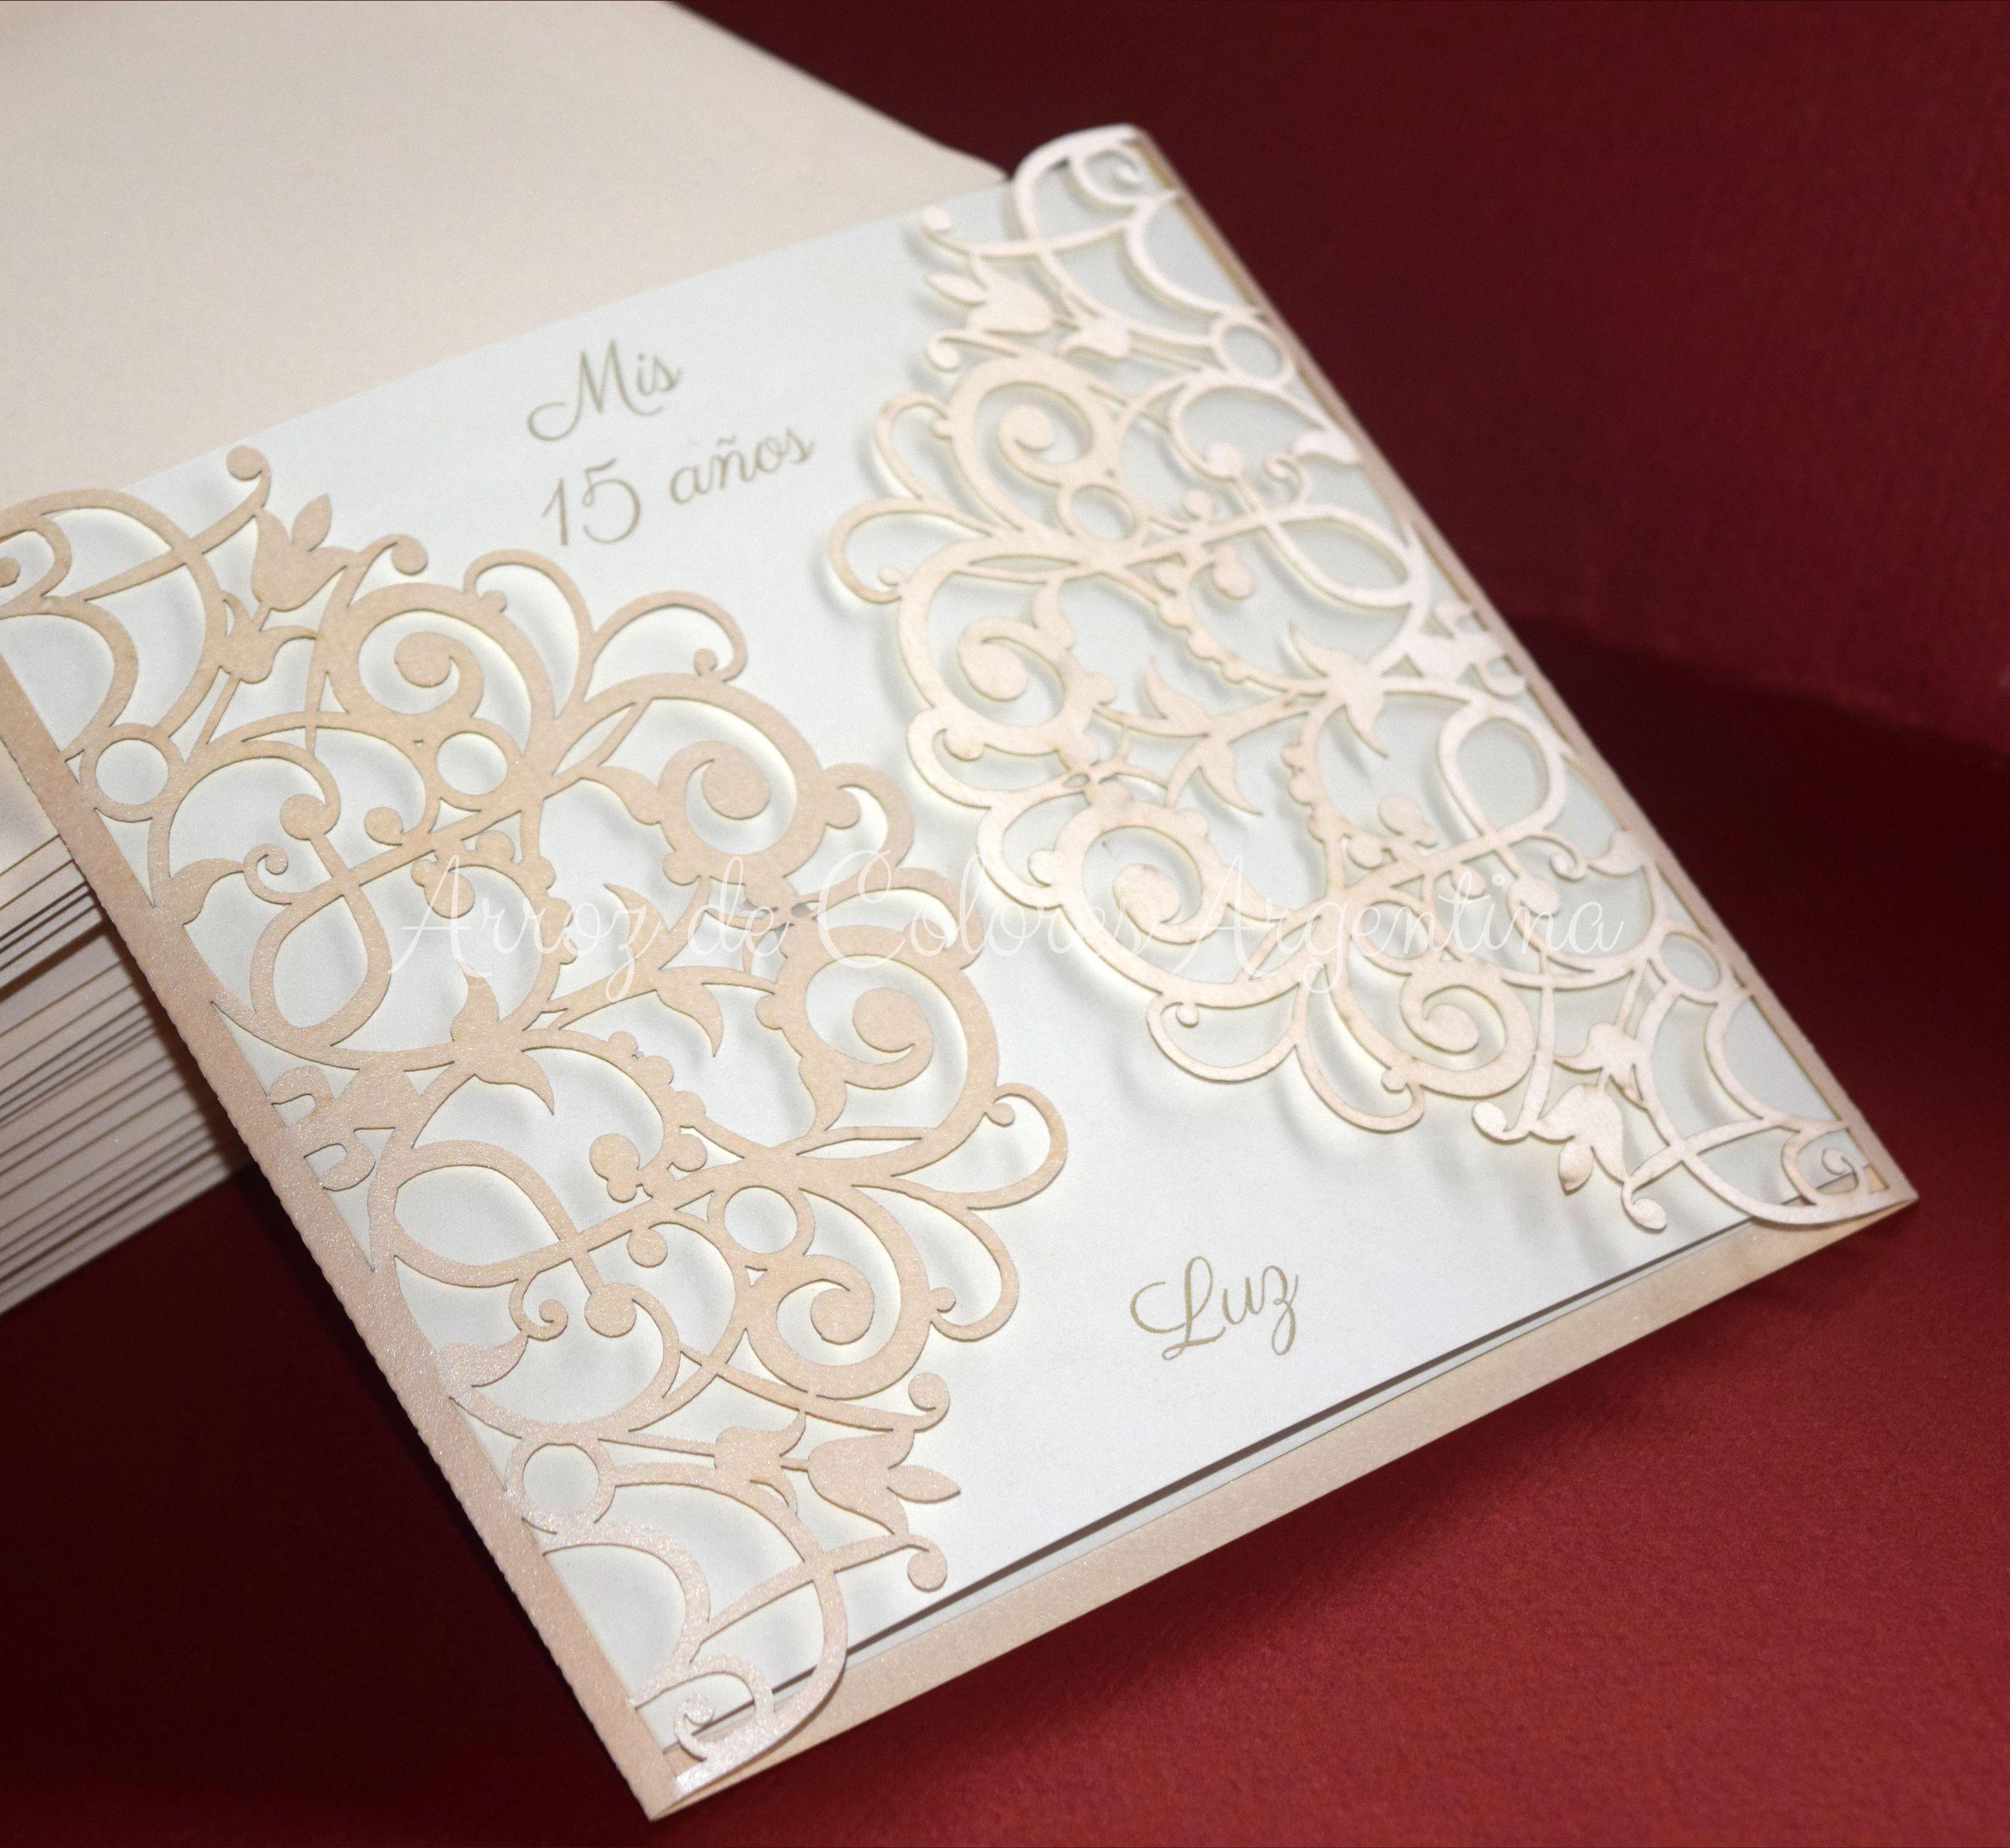 vintage wedding card design template%0A Participaci  n    a  os   dulces    calado l  ser    Laser cut invitation   sweet